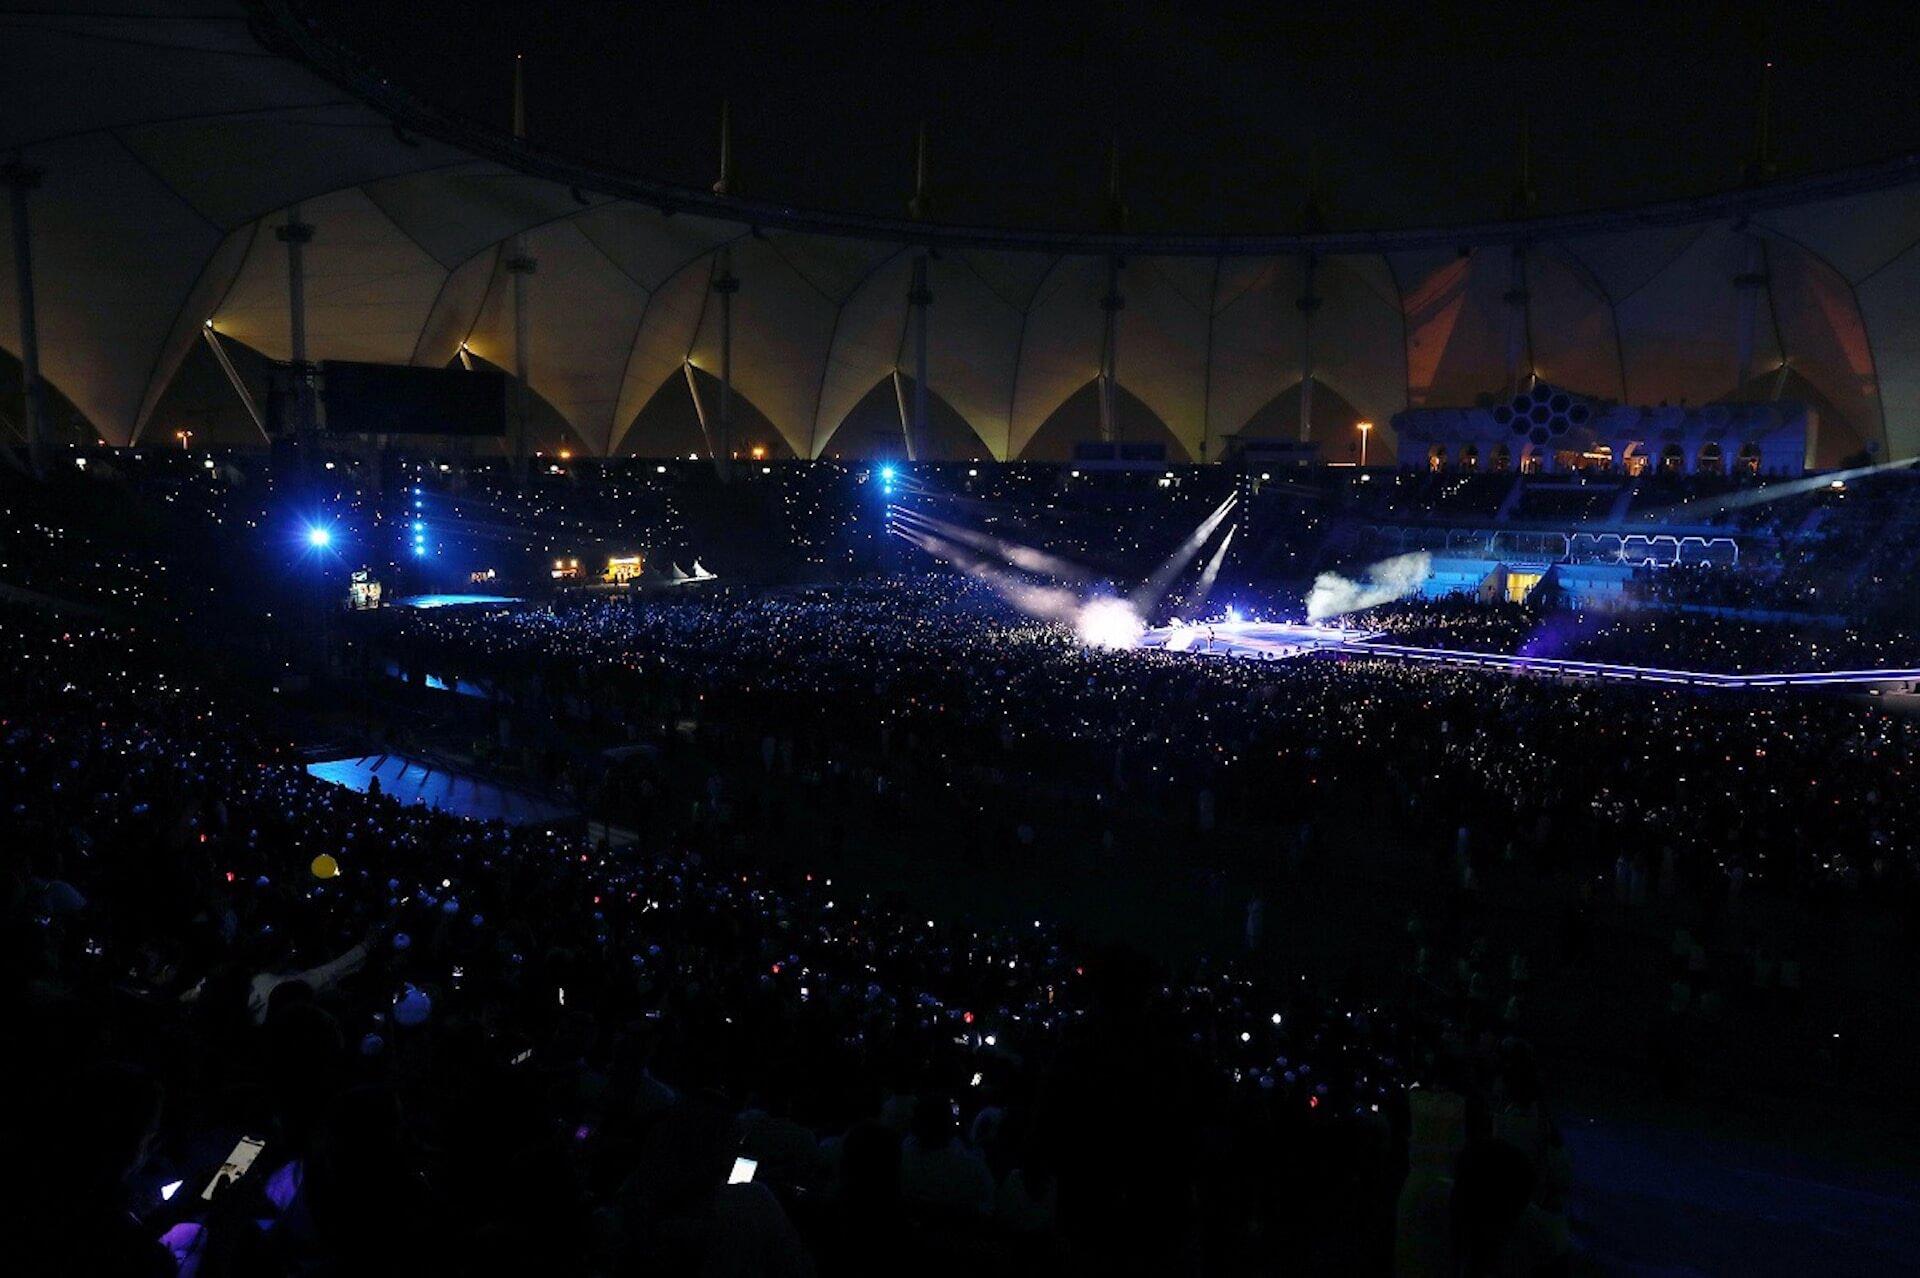 BTS、海外アーティスト初サウジアラビアのスタジアム単独コンサート開催!全世界のファンと一つになった歴史的瞬間 music191011-bts-2